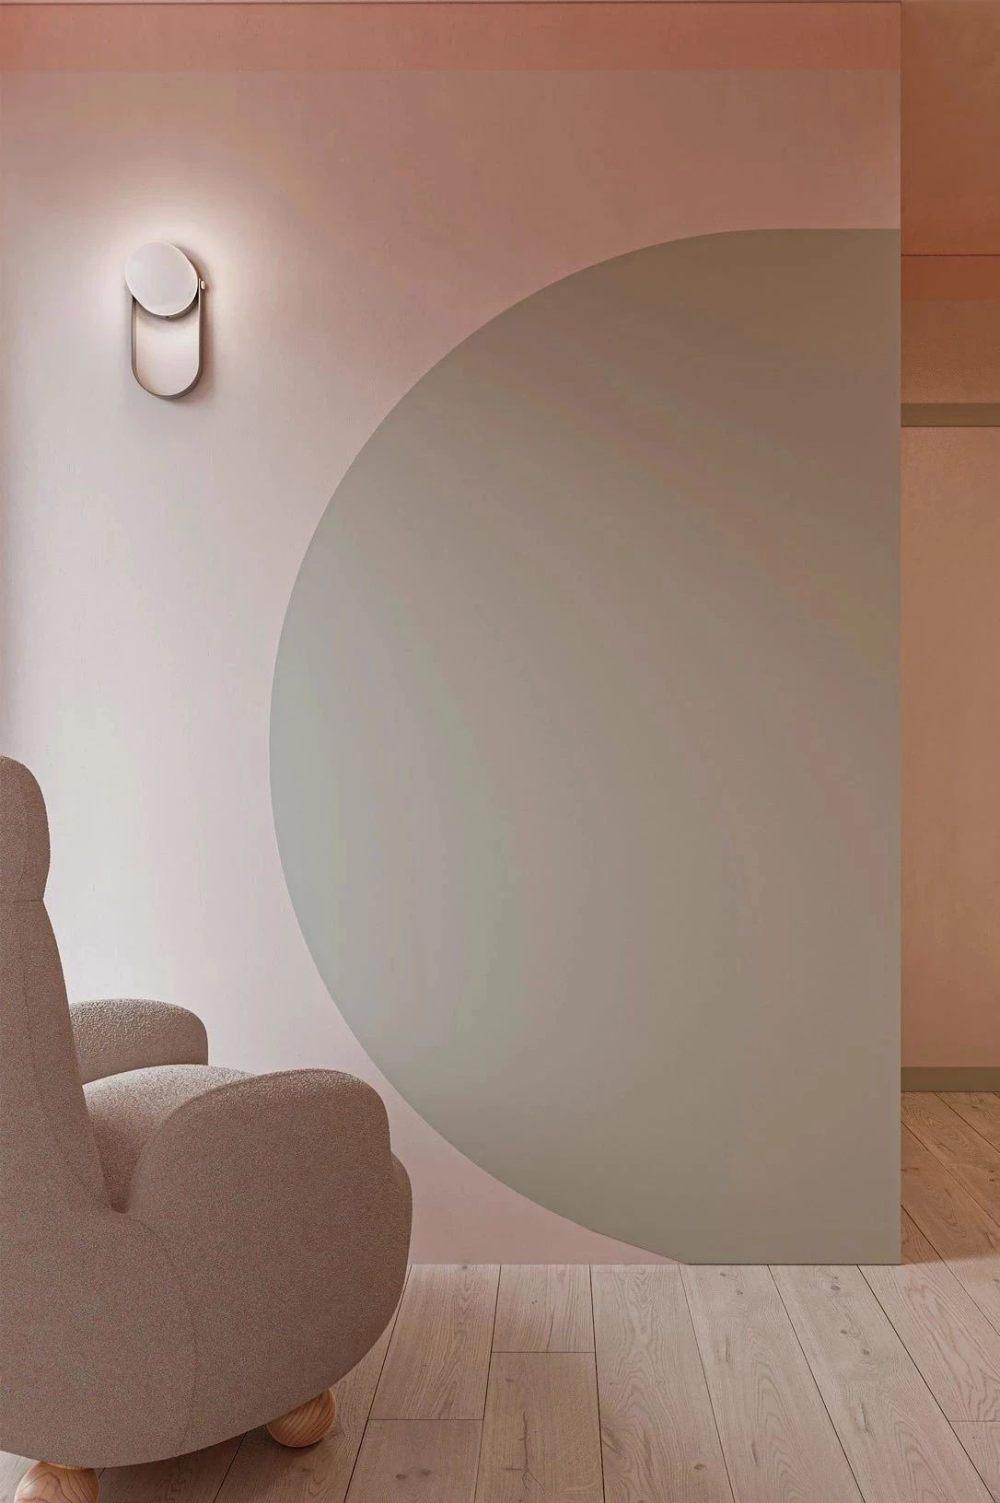 【ZROBYM architects】白俄罗斯明斯克州 高颜值、高质感住宅  _白俄罗斯明斯克州高颜值、高质感住宅25.jpg